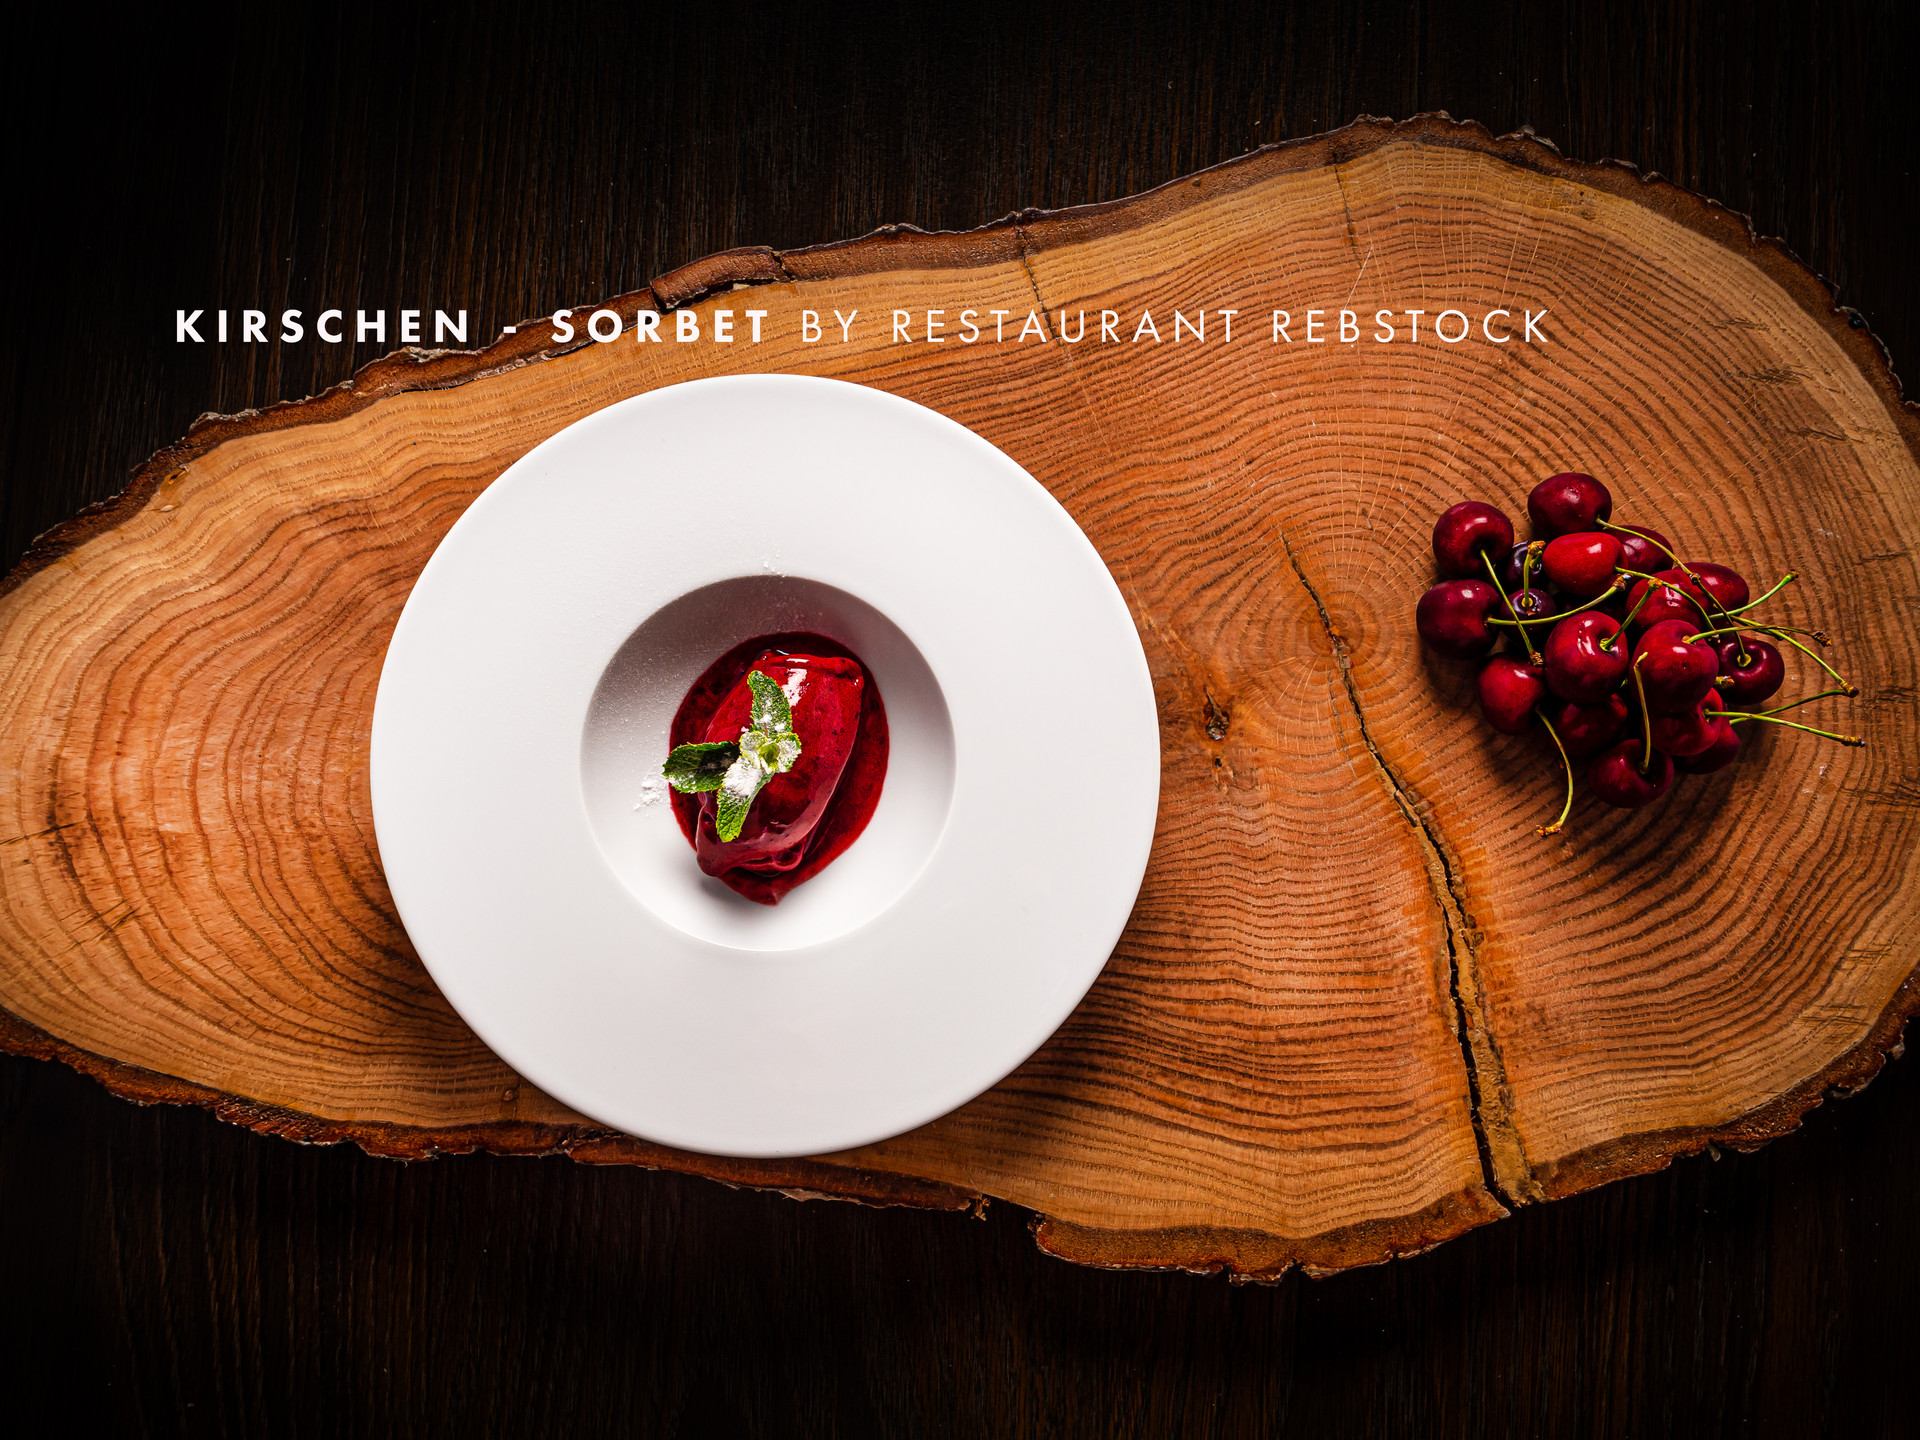 Restaurant_Rebstock_Kirschen